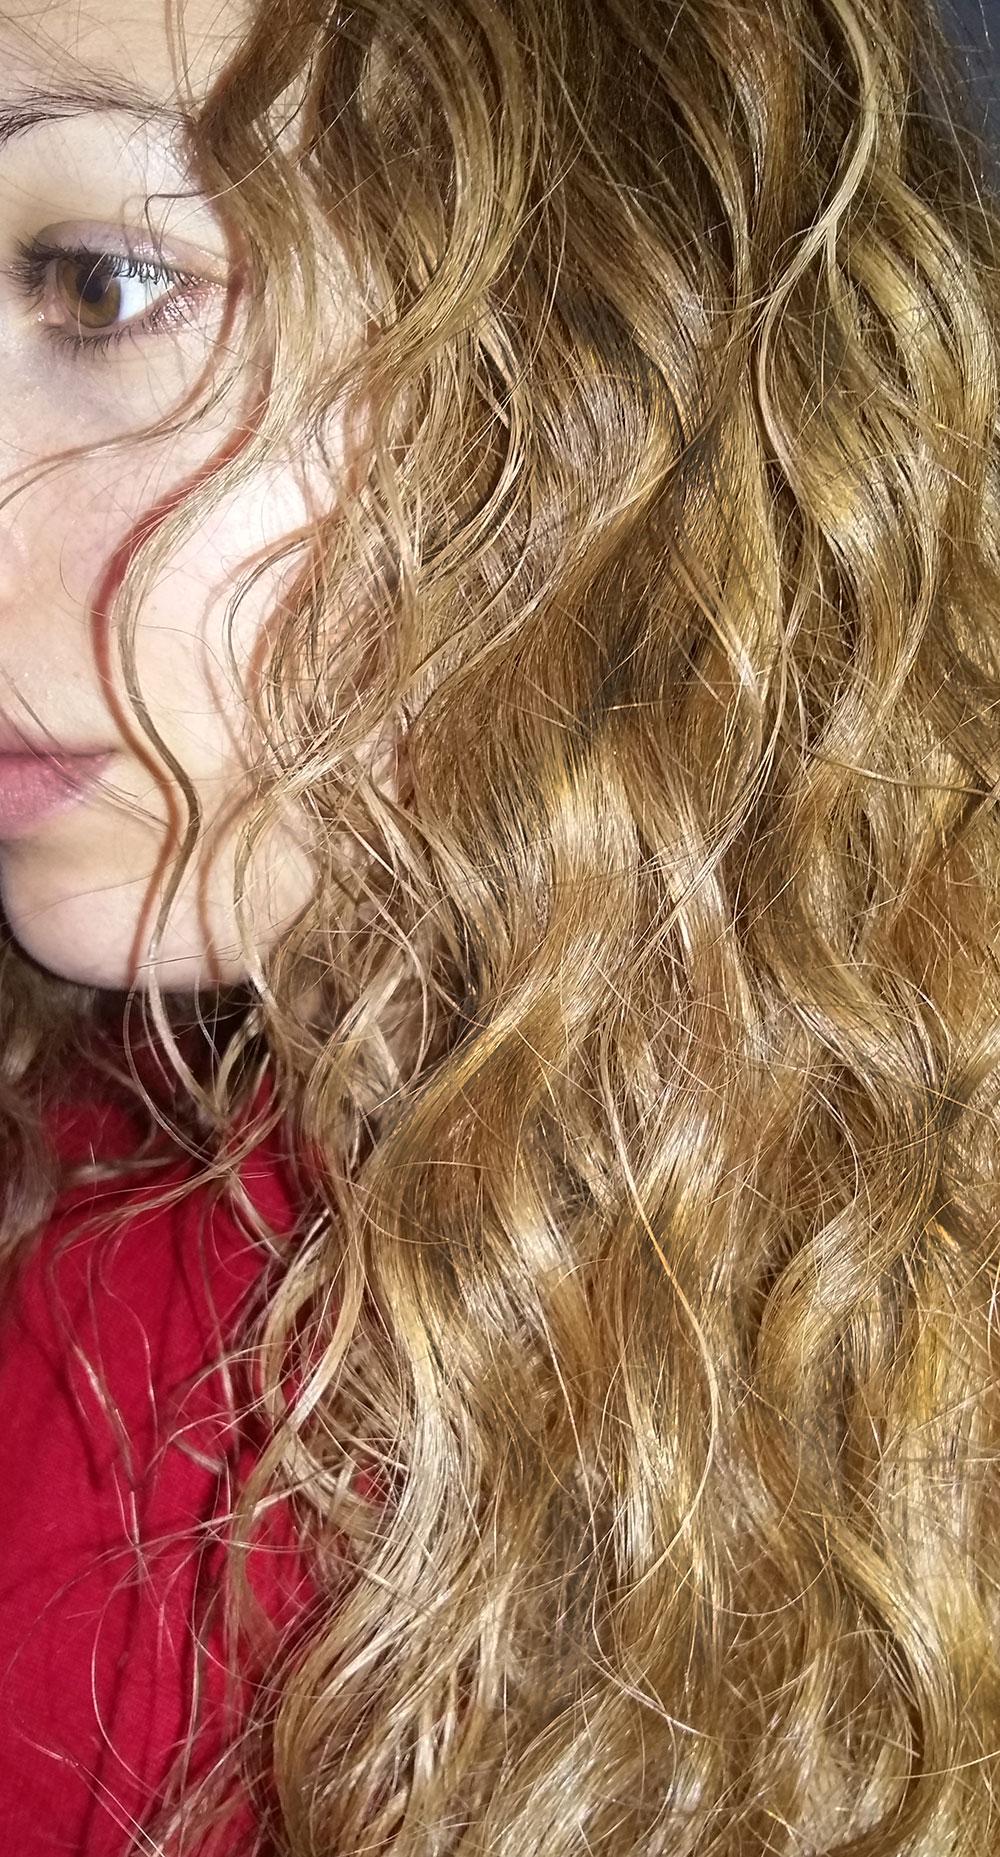 2016 02 12-effetto-capelli-hair-ricci-biondi-karotina-splendor-camomilla-shampo